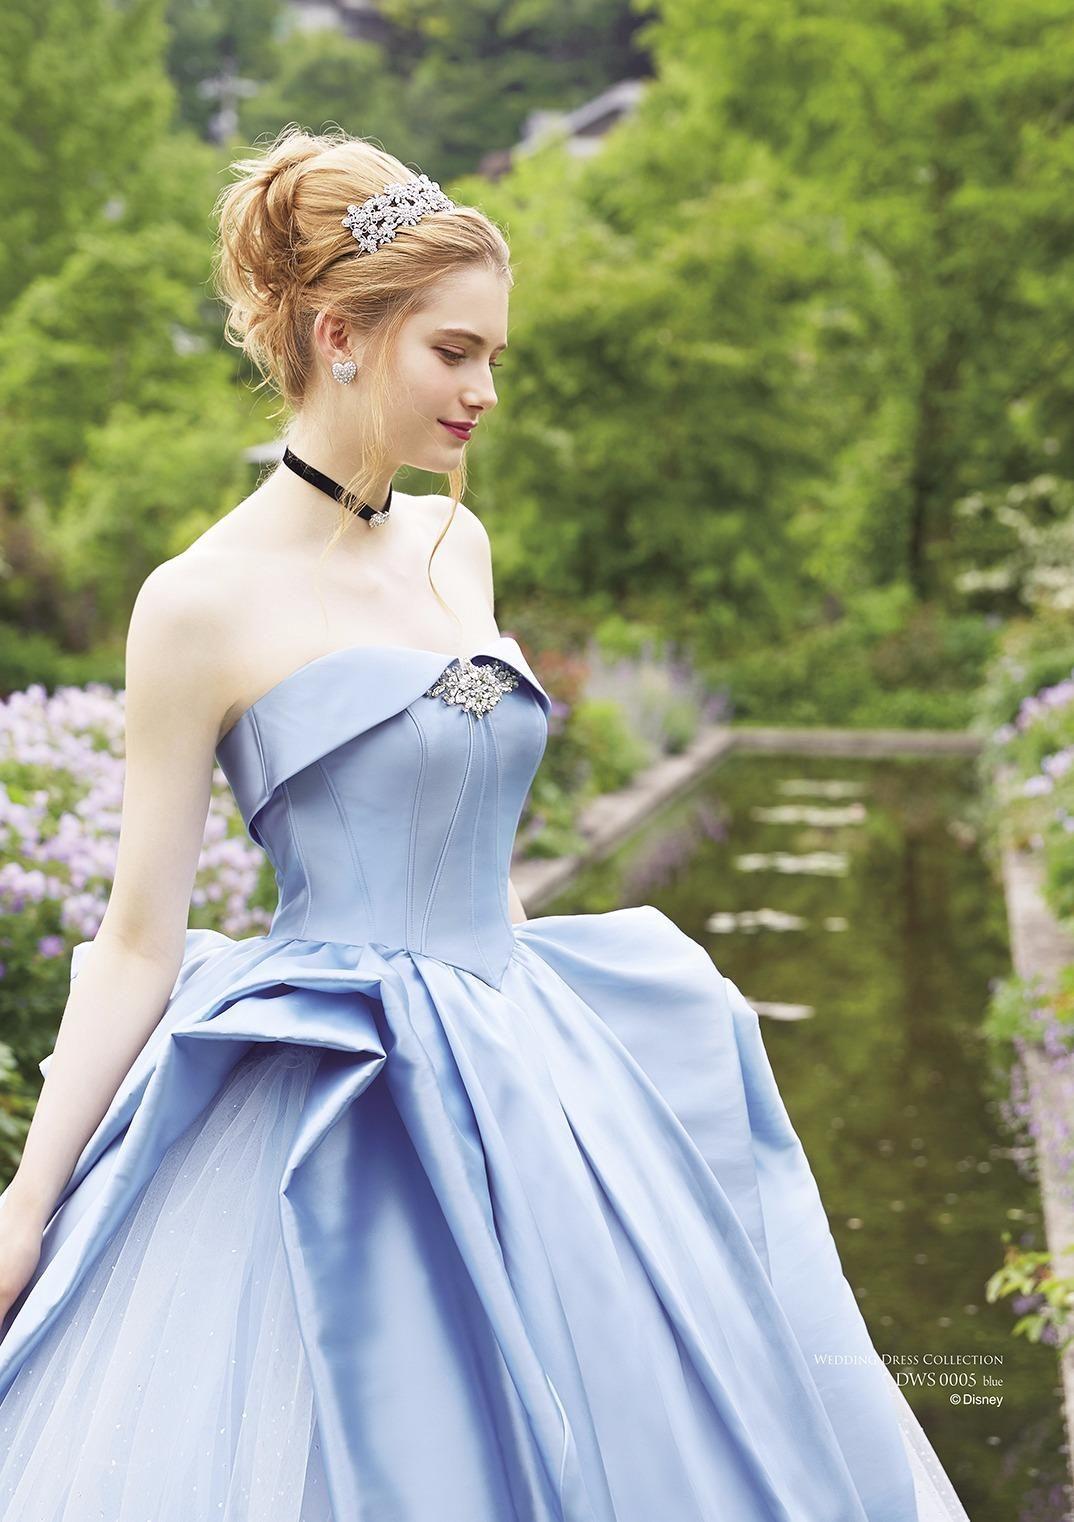 G jpeg 画像 x px disney wedding dress collection